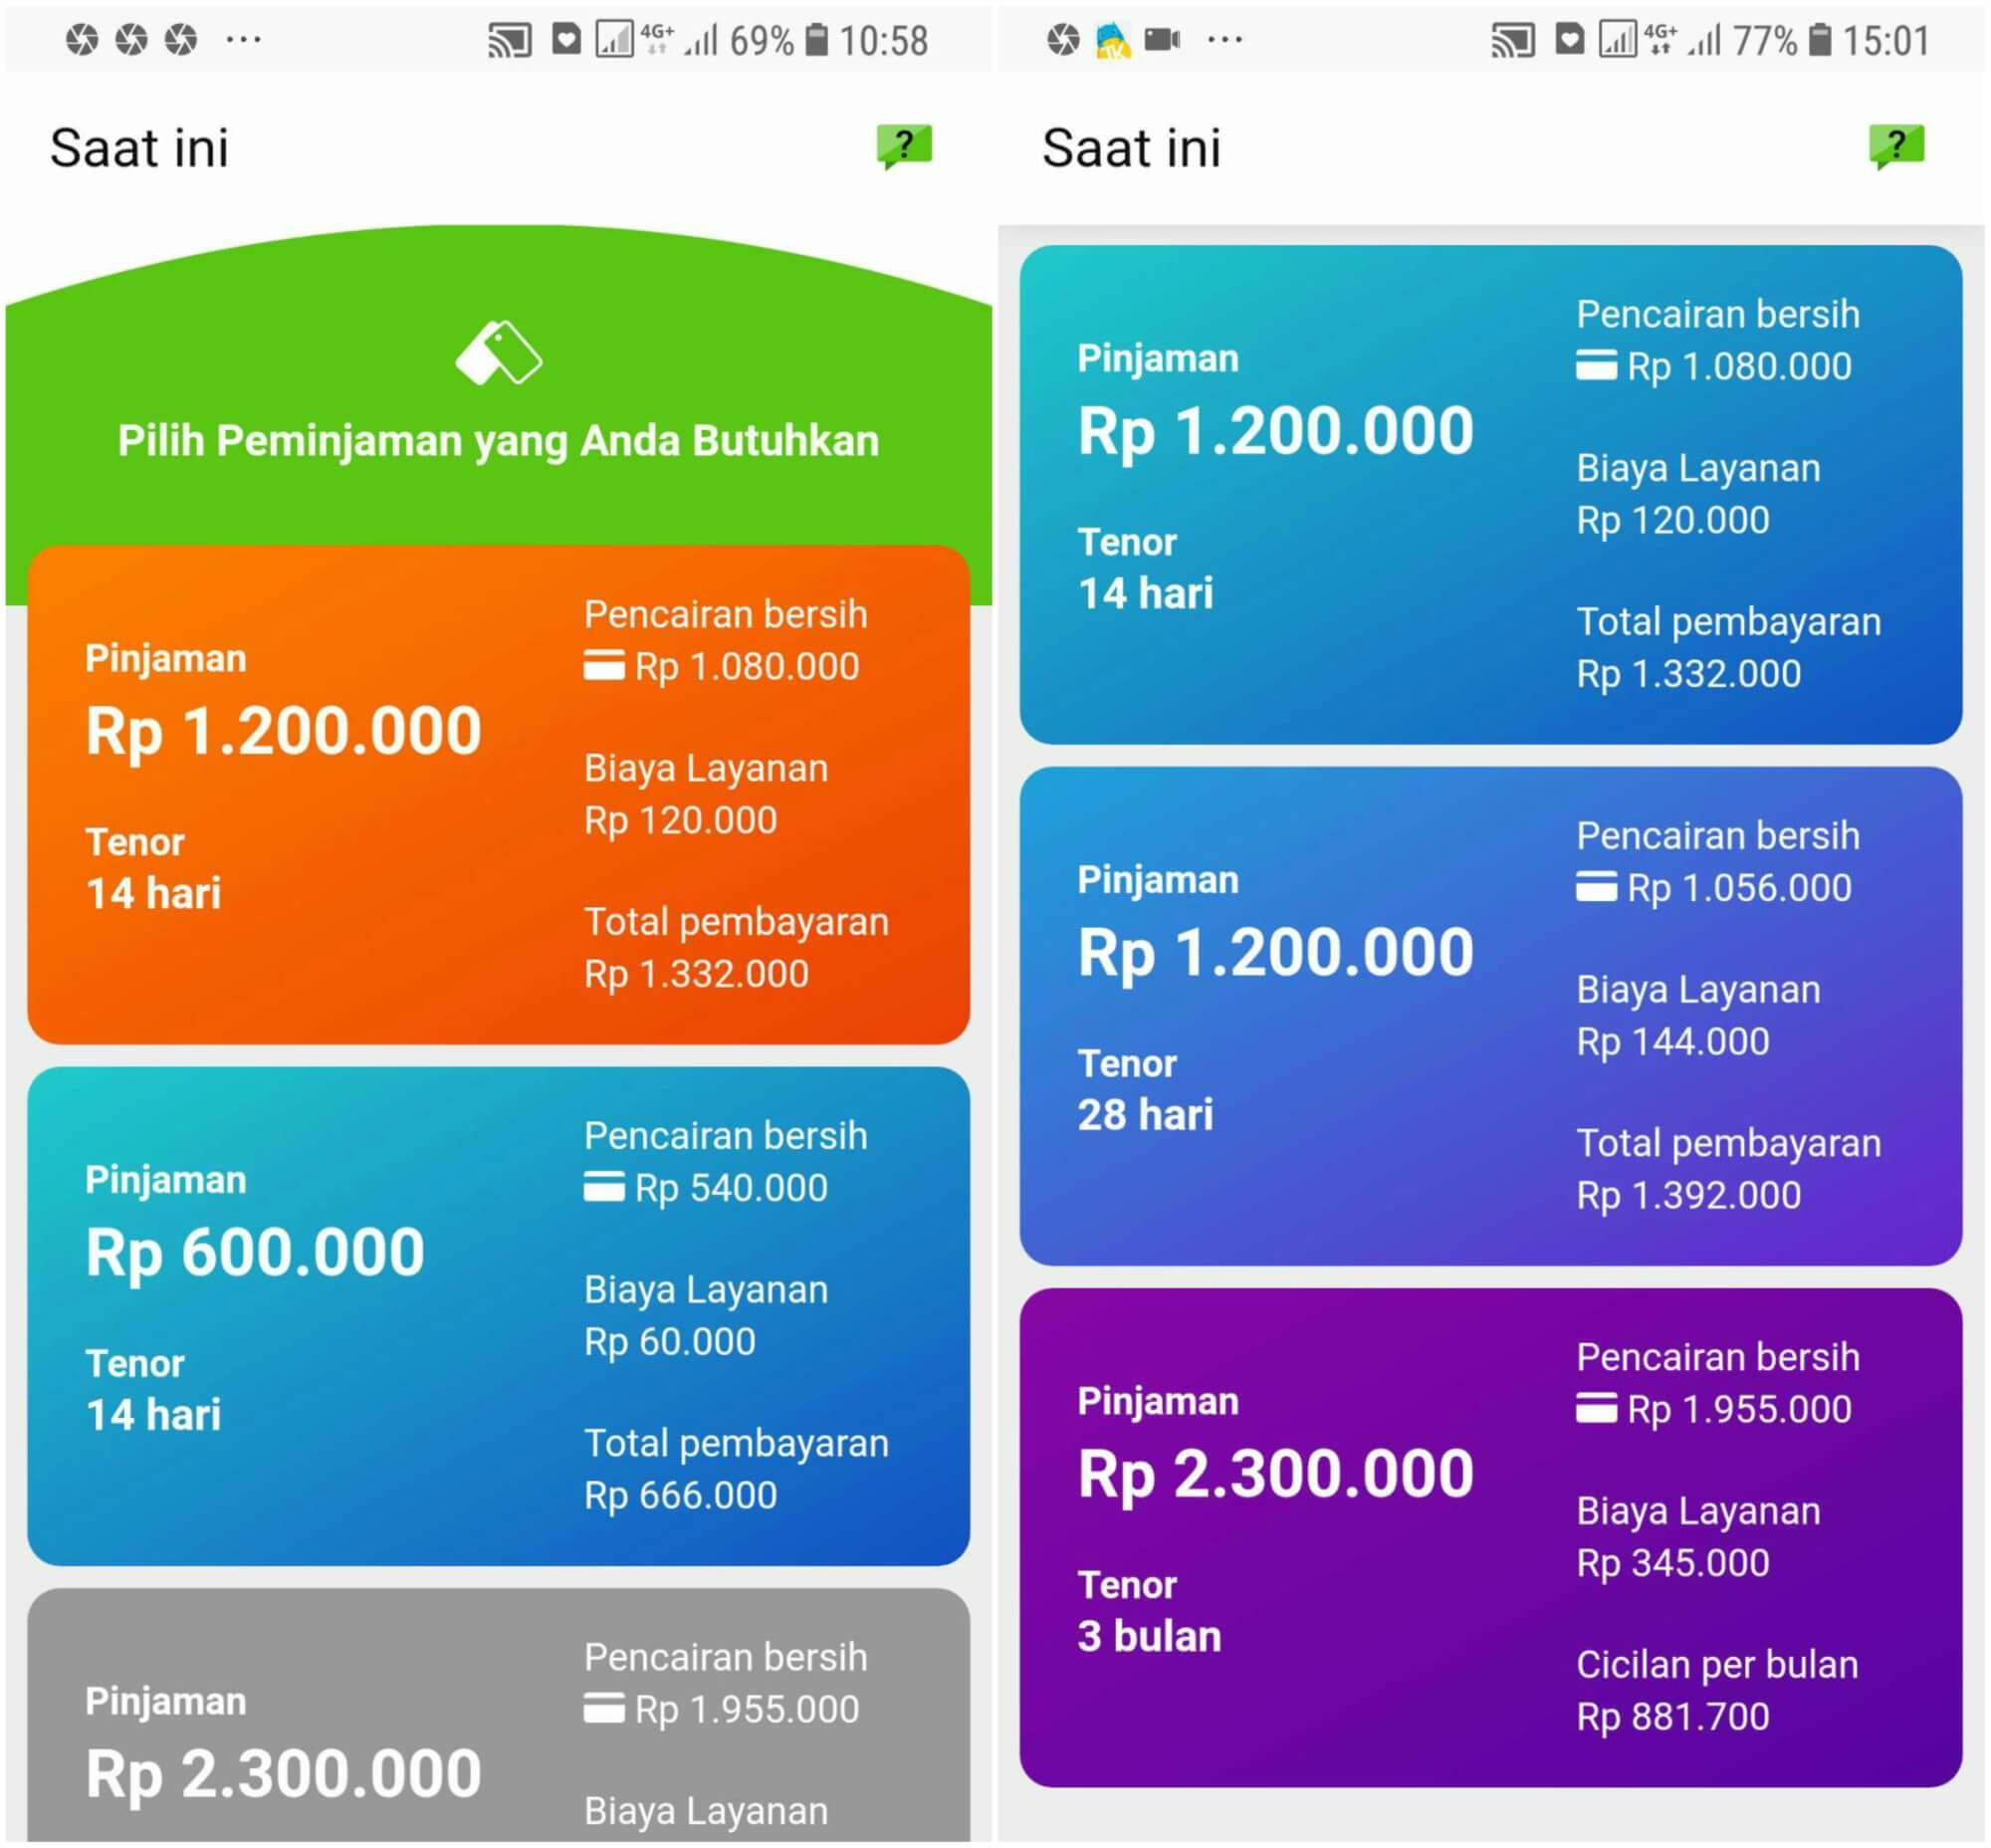 Kumpulan Pengalaman Tidak Membayar Pinjaman Online